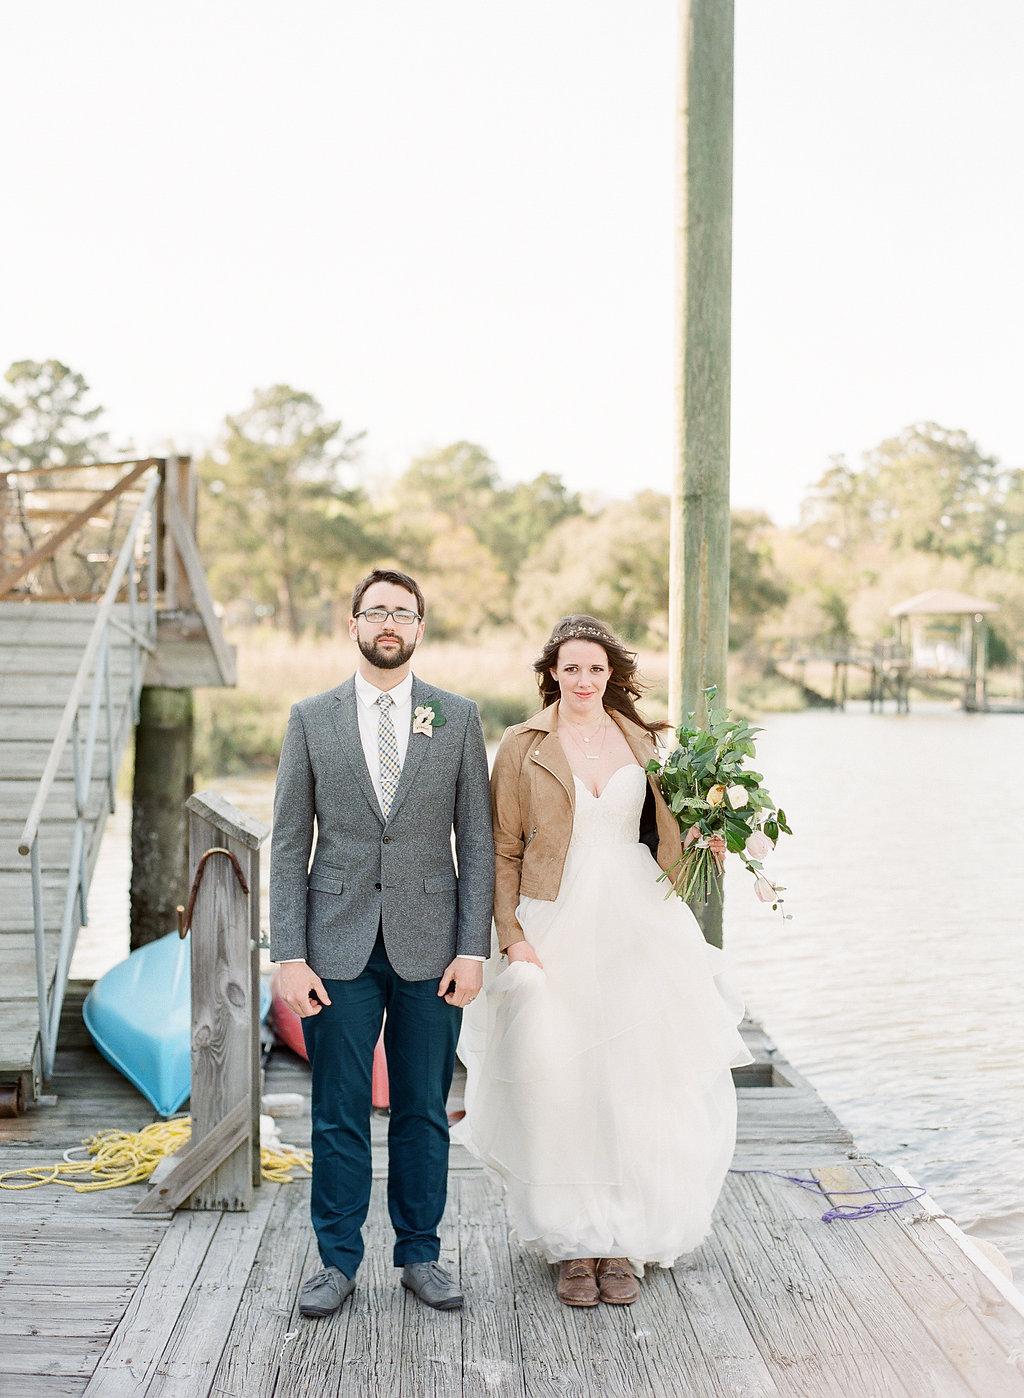 the-wyld-ivory-and-beau-sarah-seven-worthington-wedding-dress-savannah-bridal-boutique-savannah-wedding-dresses-leather-jacket-the-wyld-dock-bar-wedding.jpg